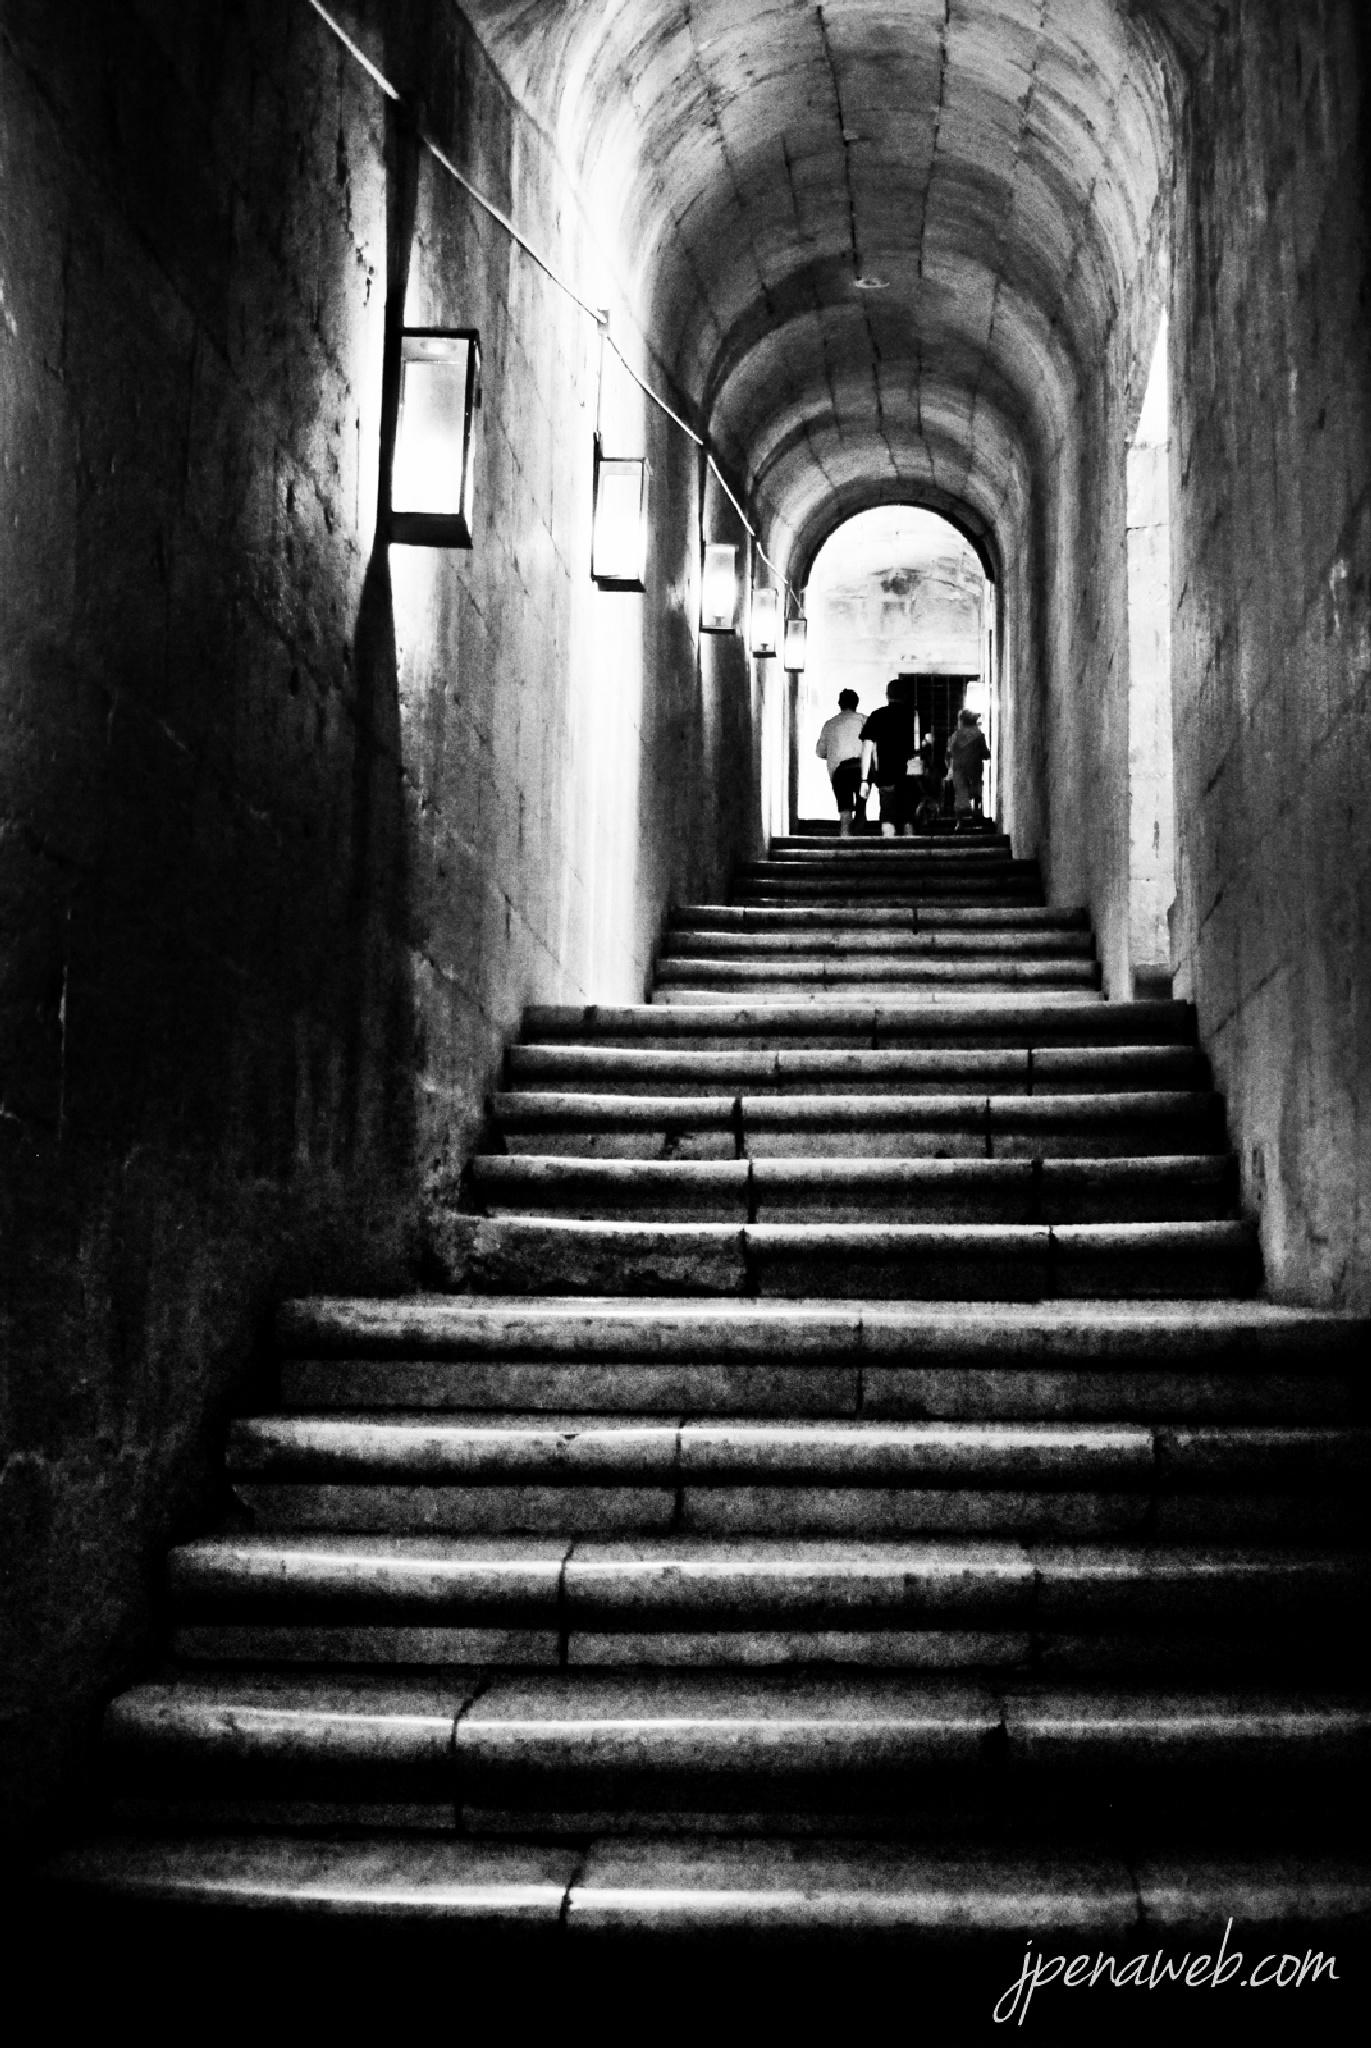 Stairway to heaven by jesus pena